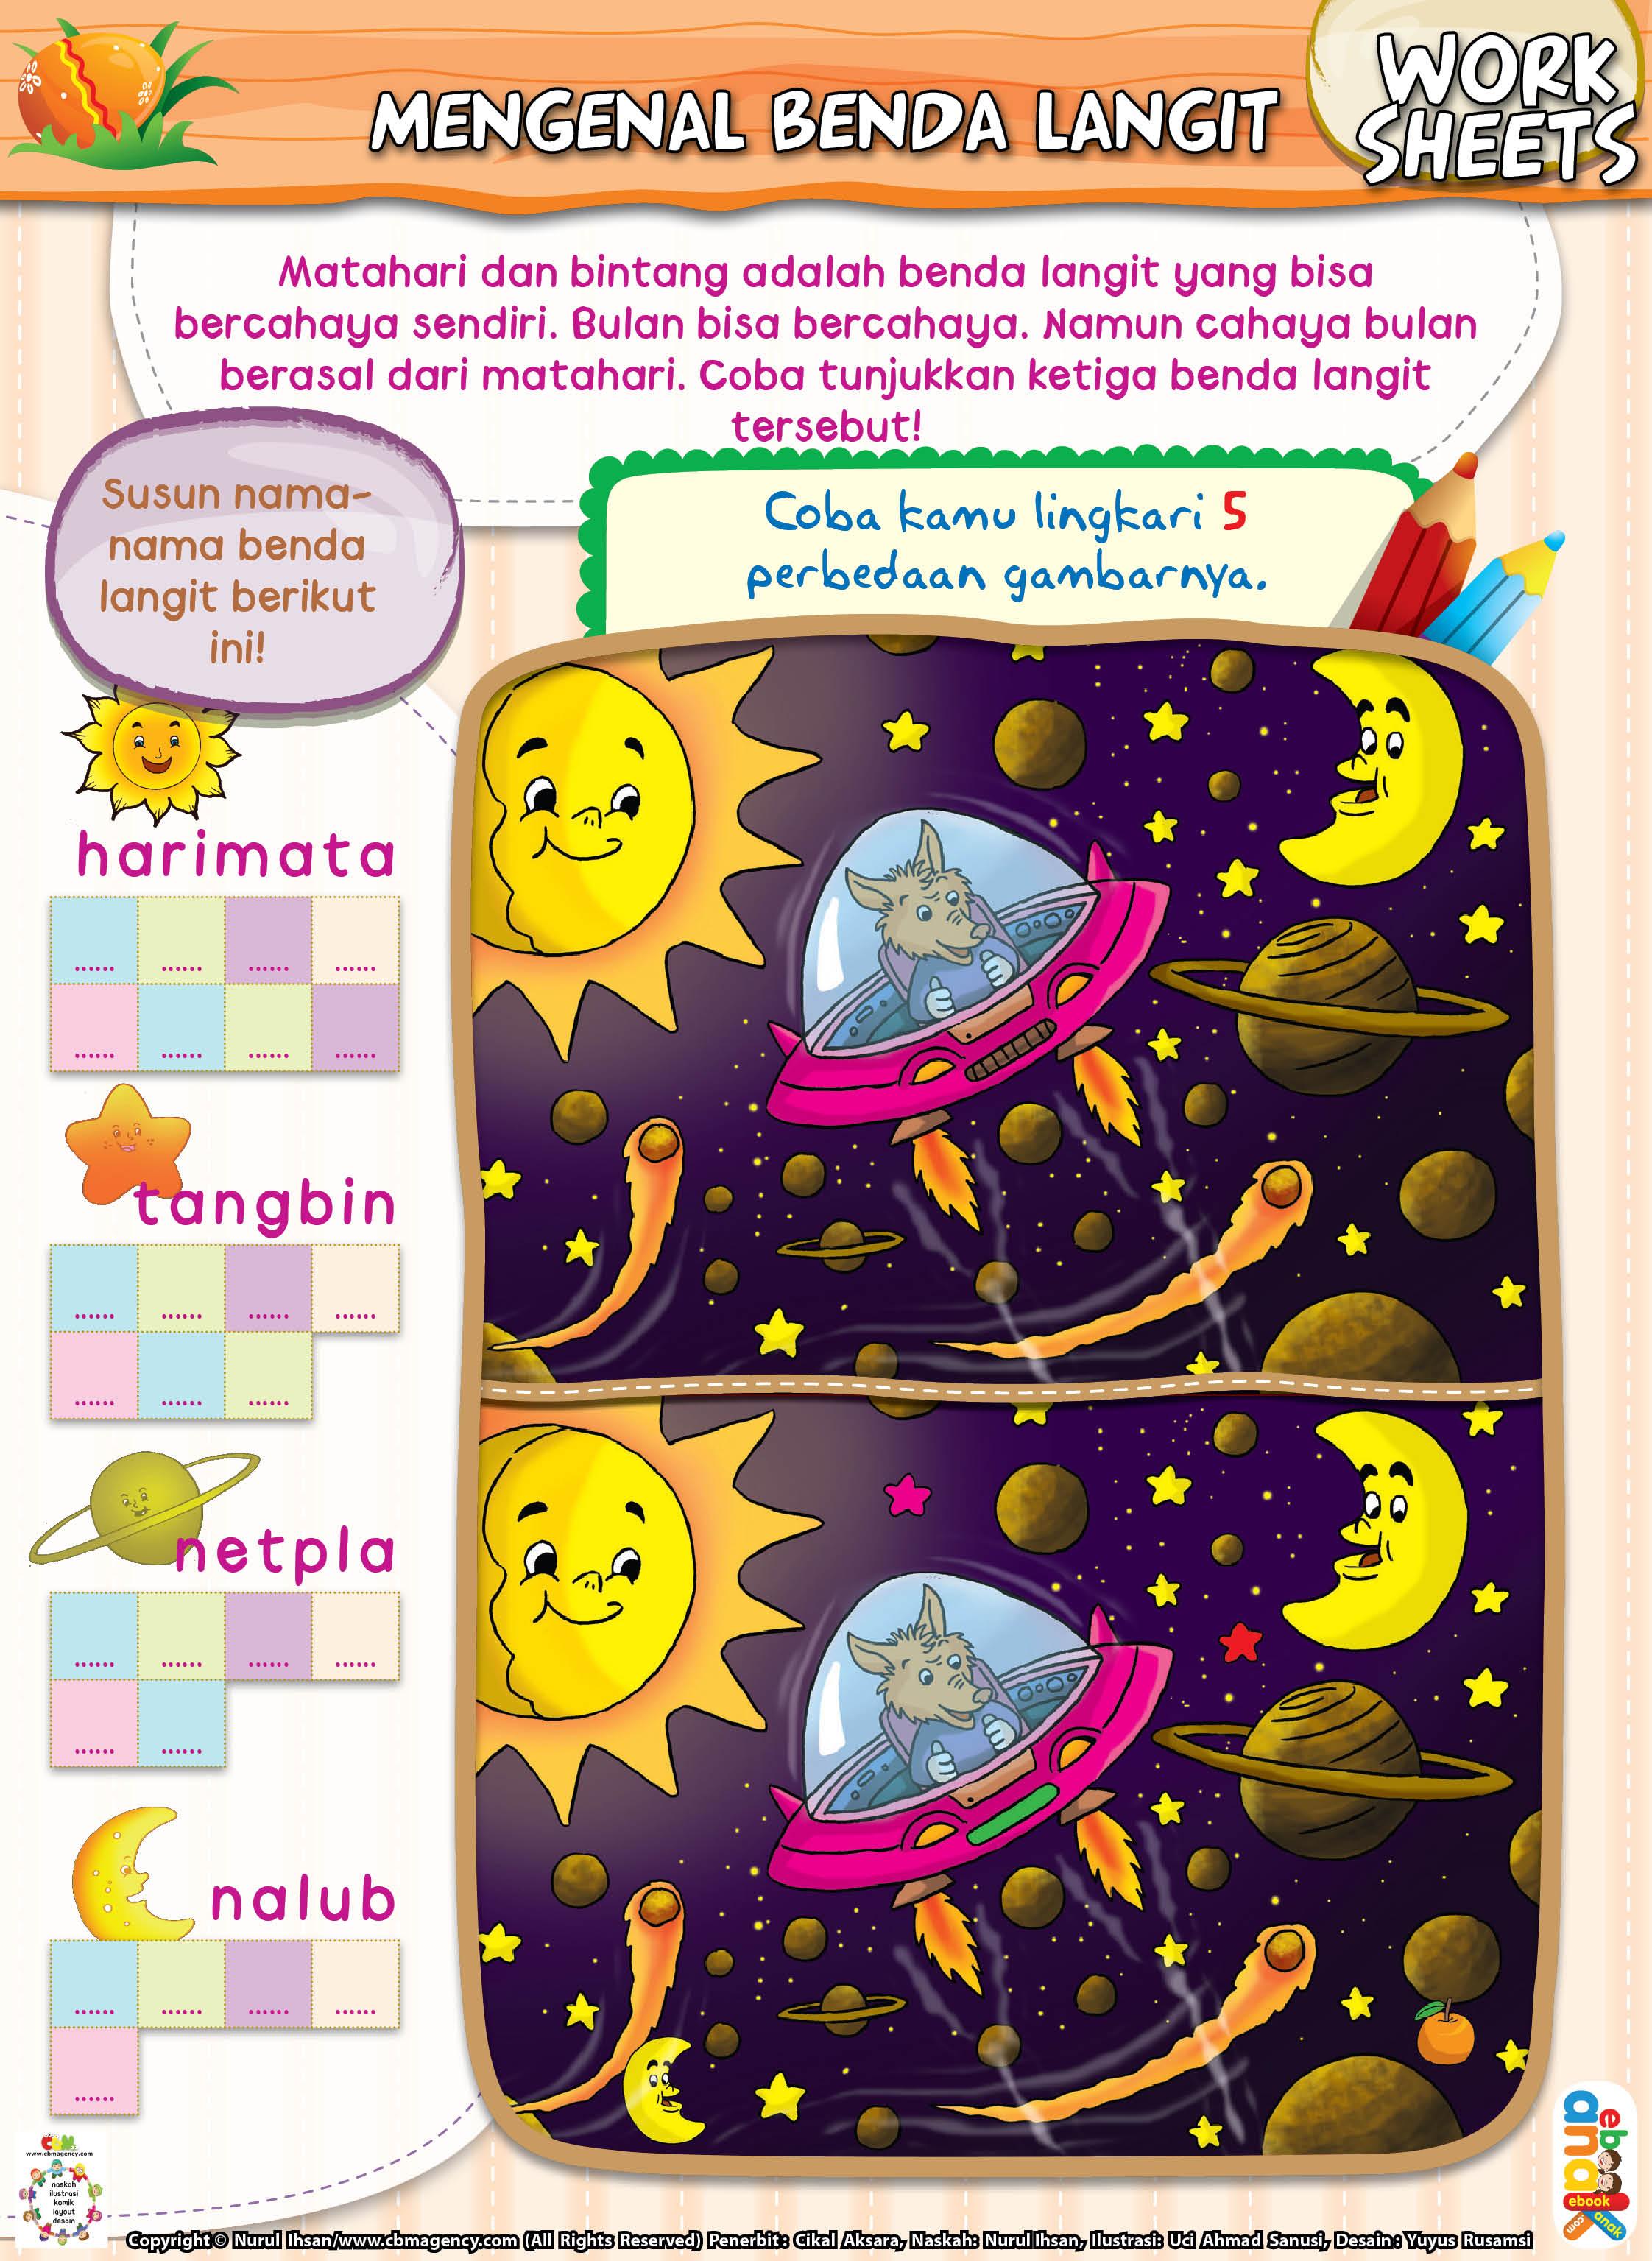 Mengenal Benda Langit Ebook Anak